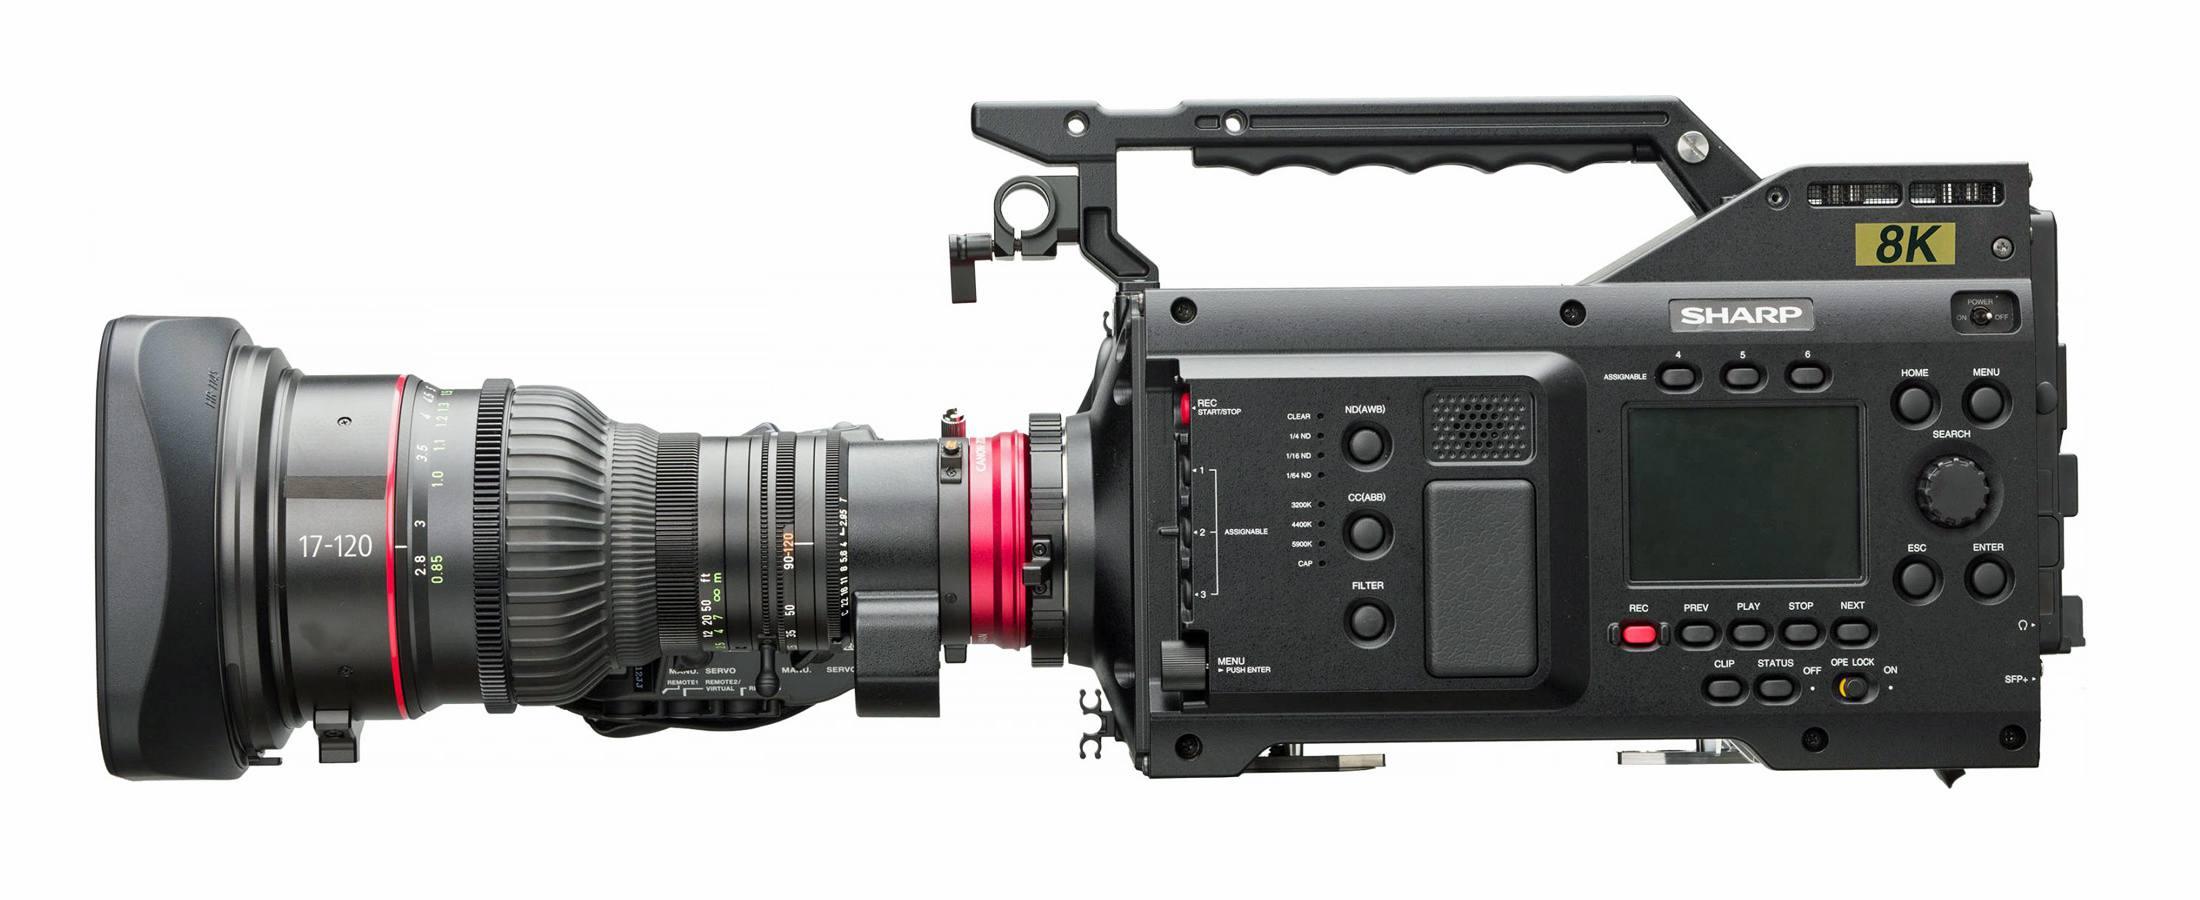 Sharp 8C-B60A 8K Camcorder